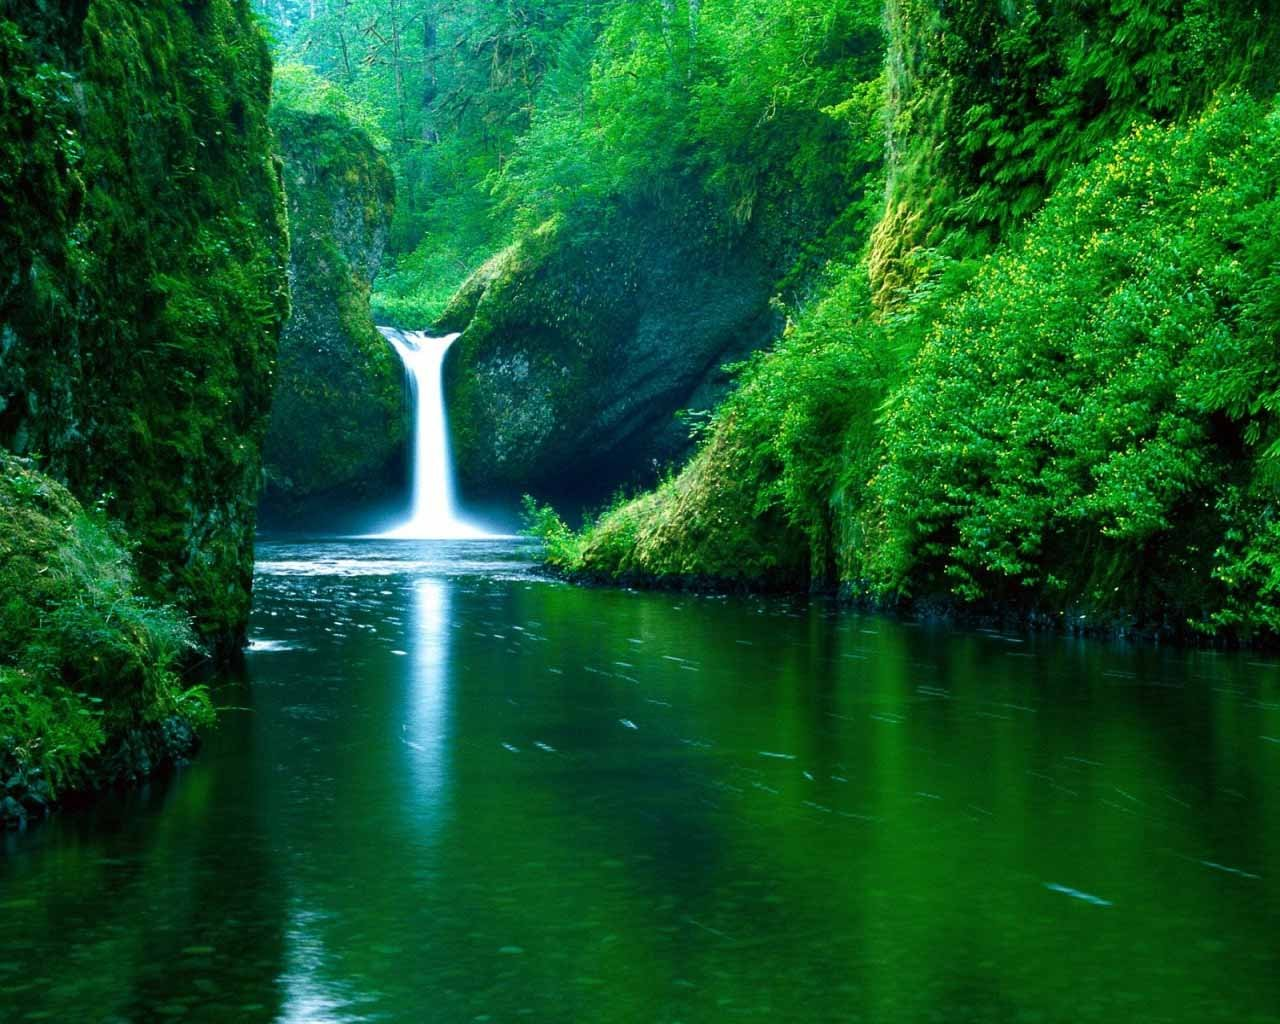 Imagenes De Paisajes Hermosos Naturales - Fotos paisajes naturales hermosos e increibles del mundo